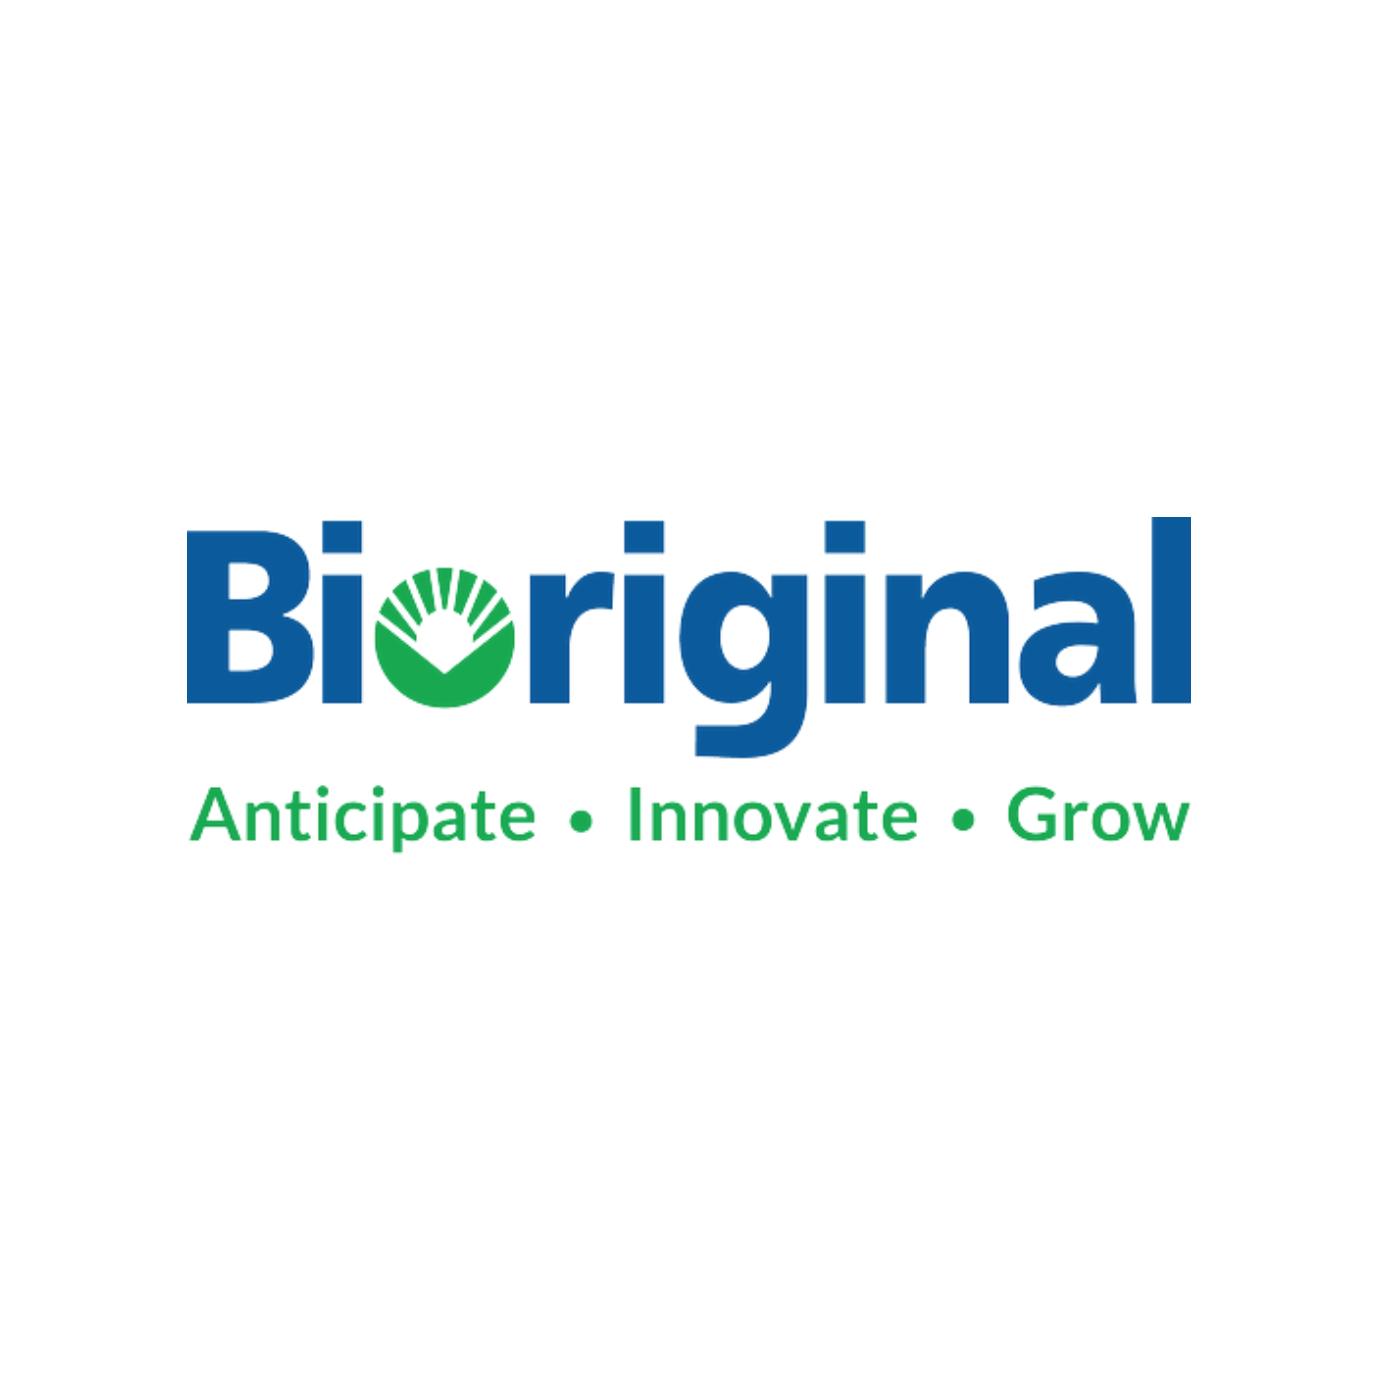 Bioriginal logo - Certified Paleo, Certified Paleo Friendly, KETO Certified by the Paleo Foundation